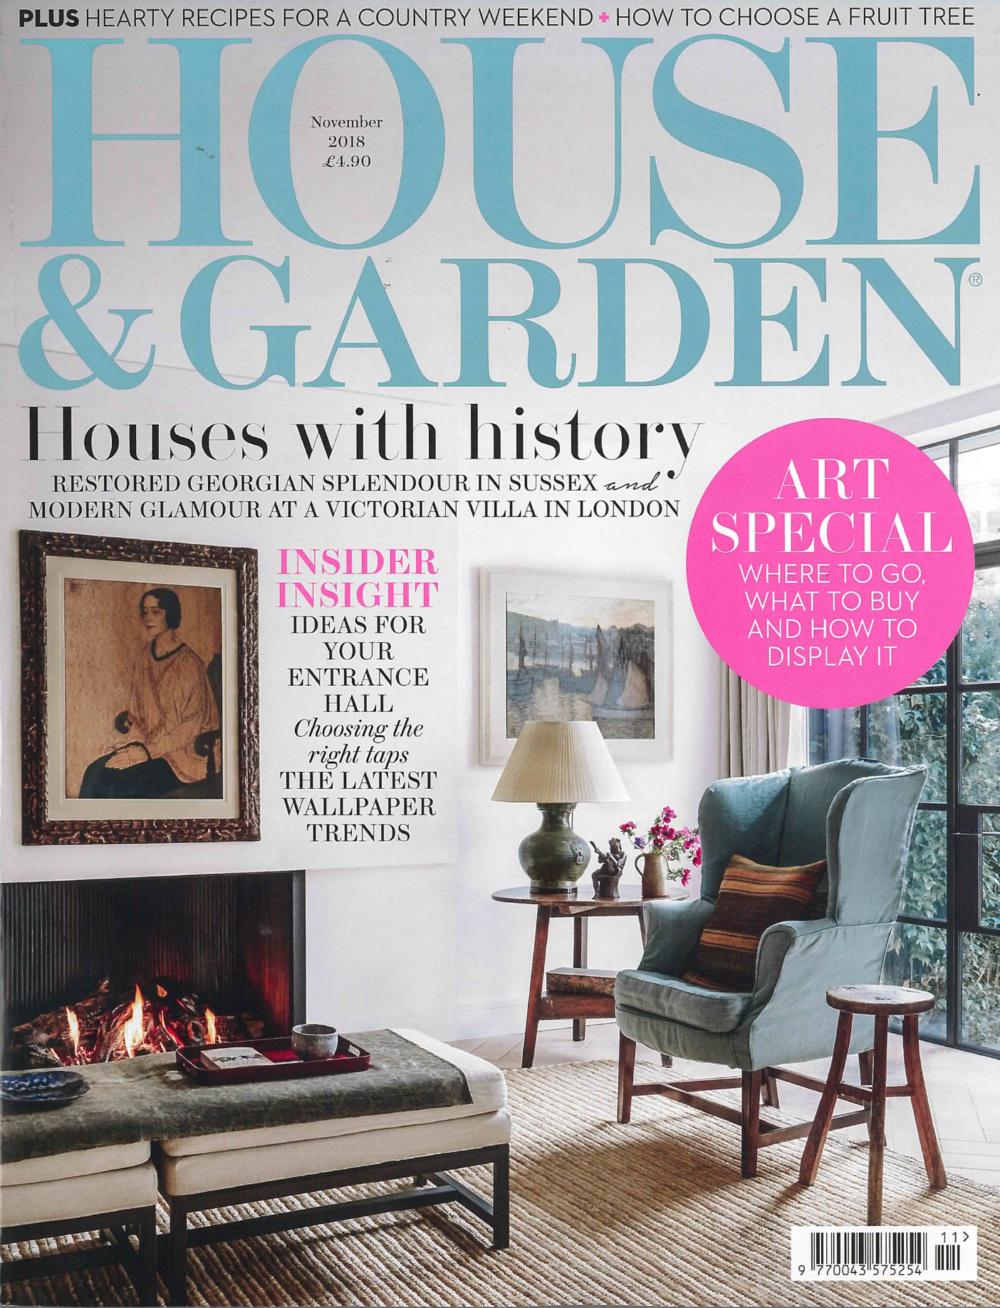 HOUSE & GARDEN MAGAZINE NOVEMBER 2018